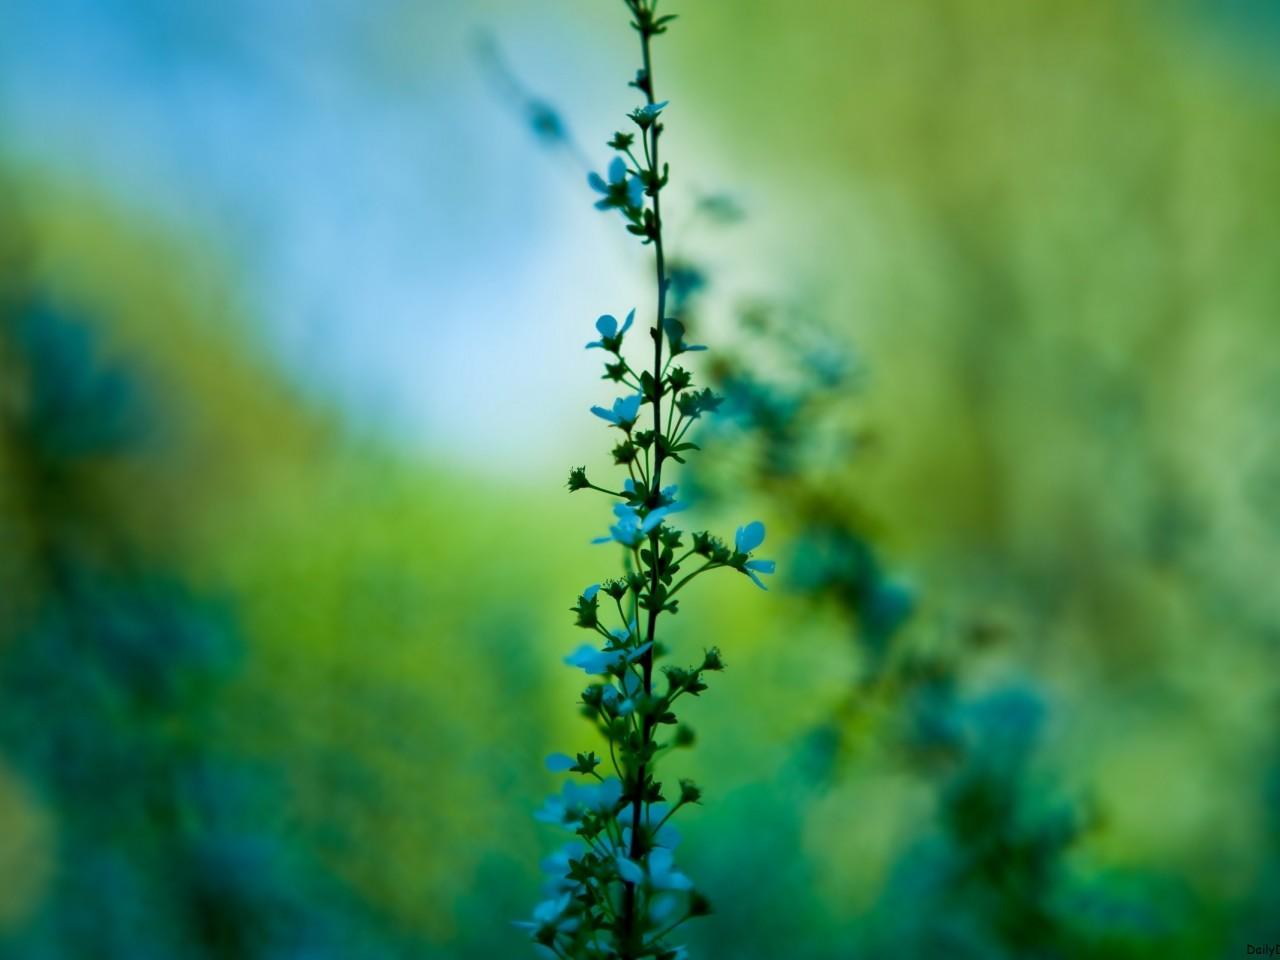 Delicate Blue Flowers Hd Wallpapers